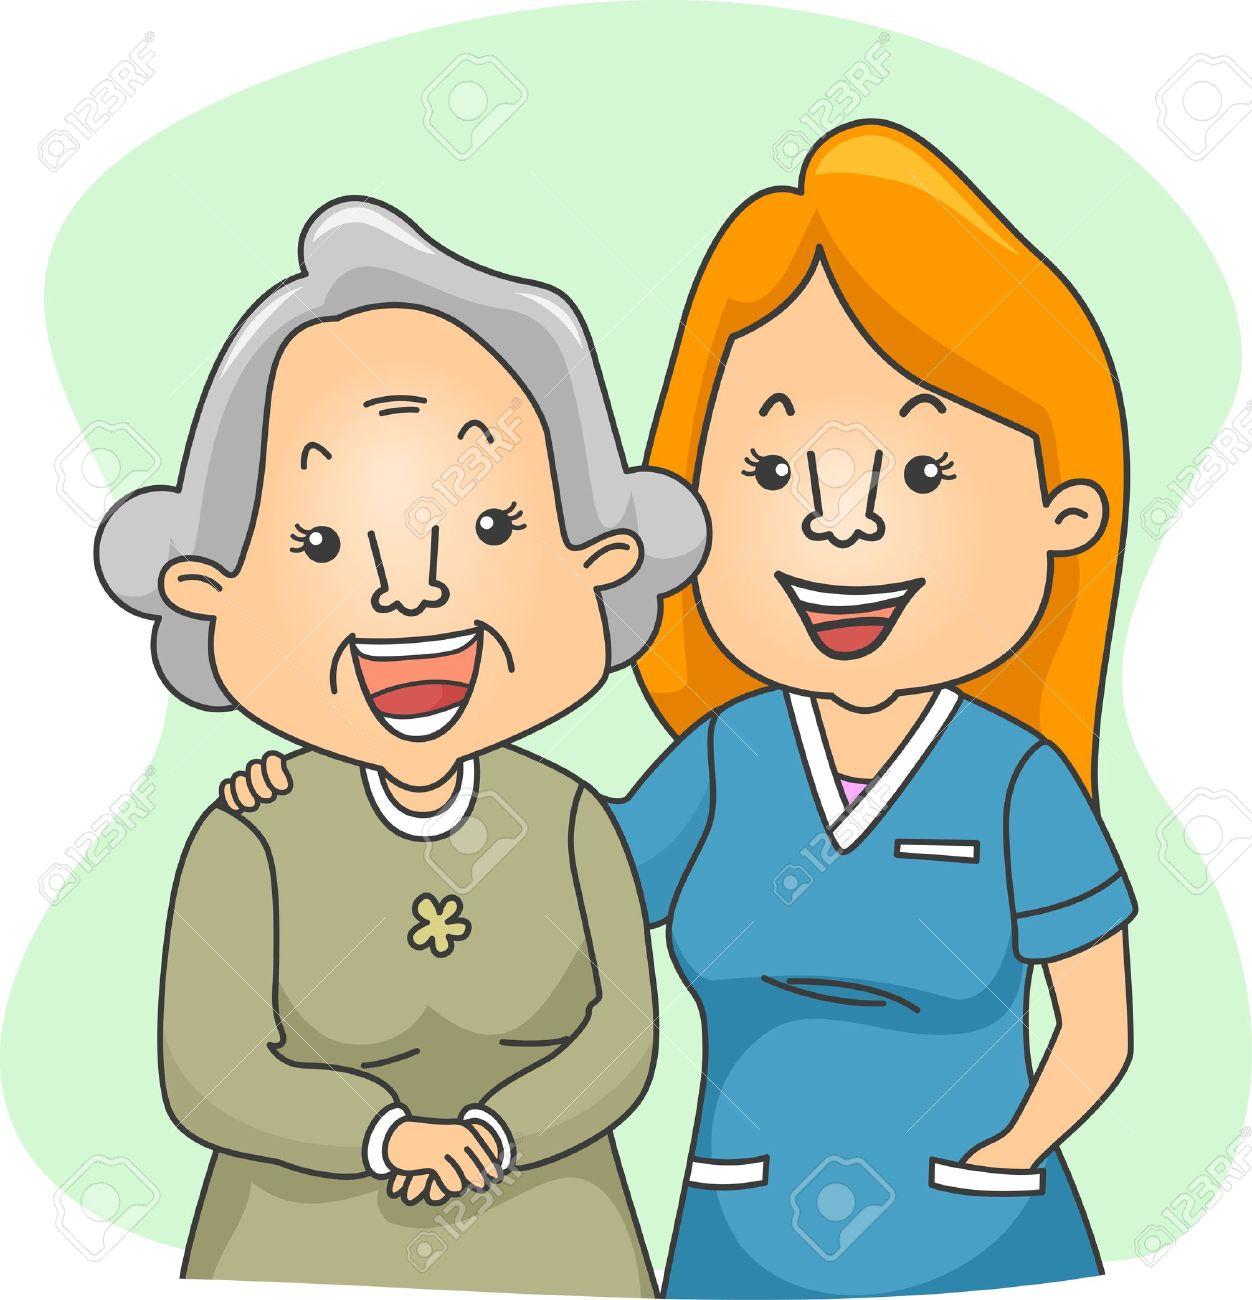 Симпатичная медсестра и пациент 17 фотография